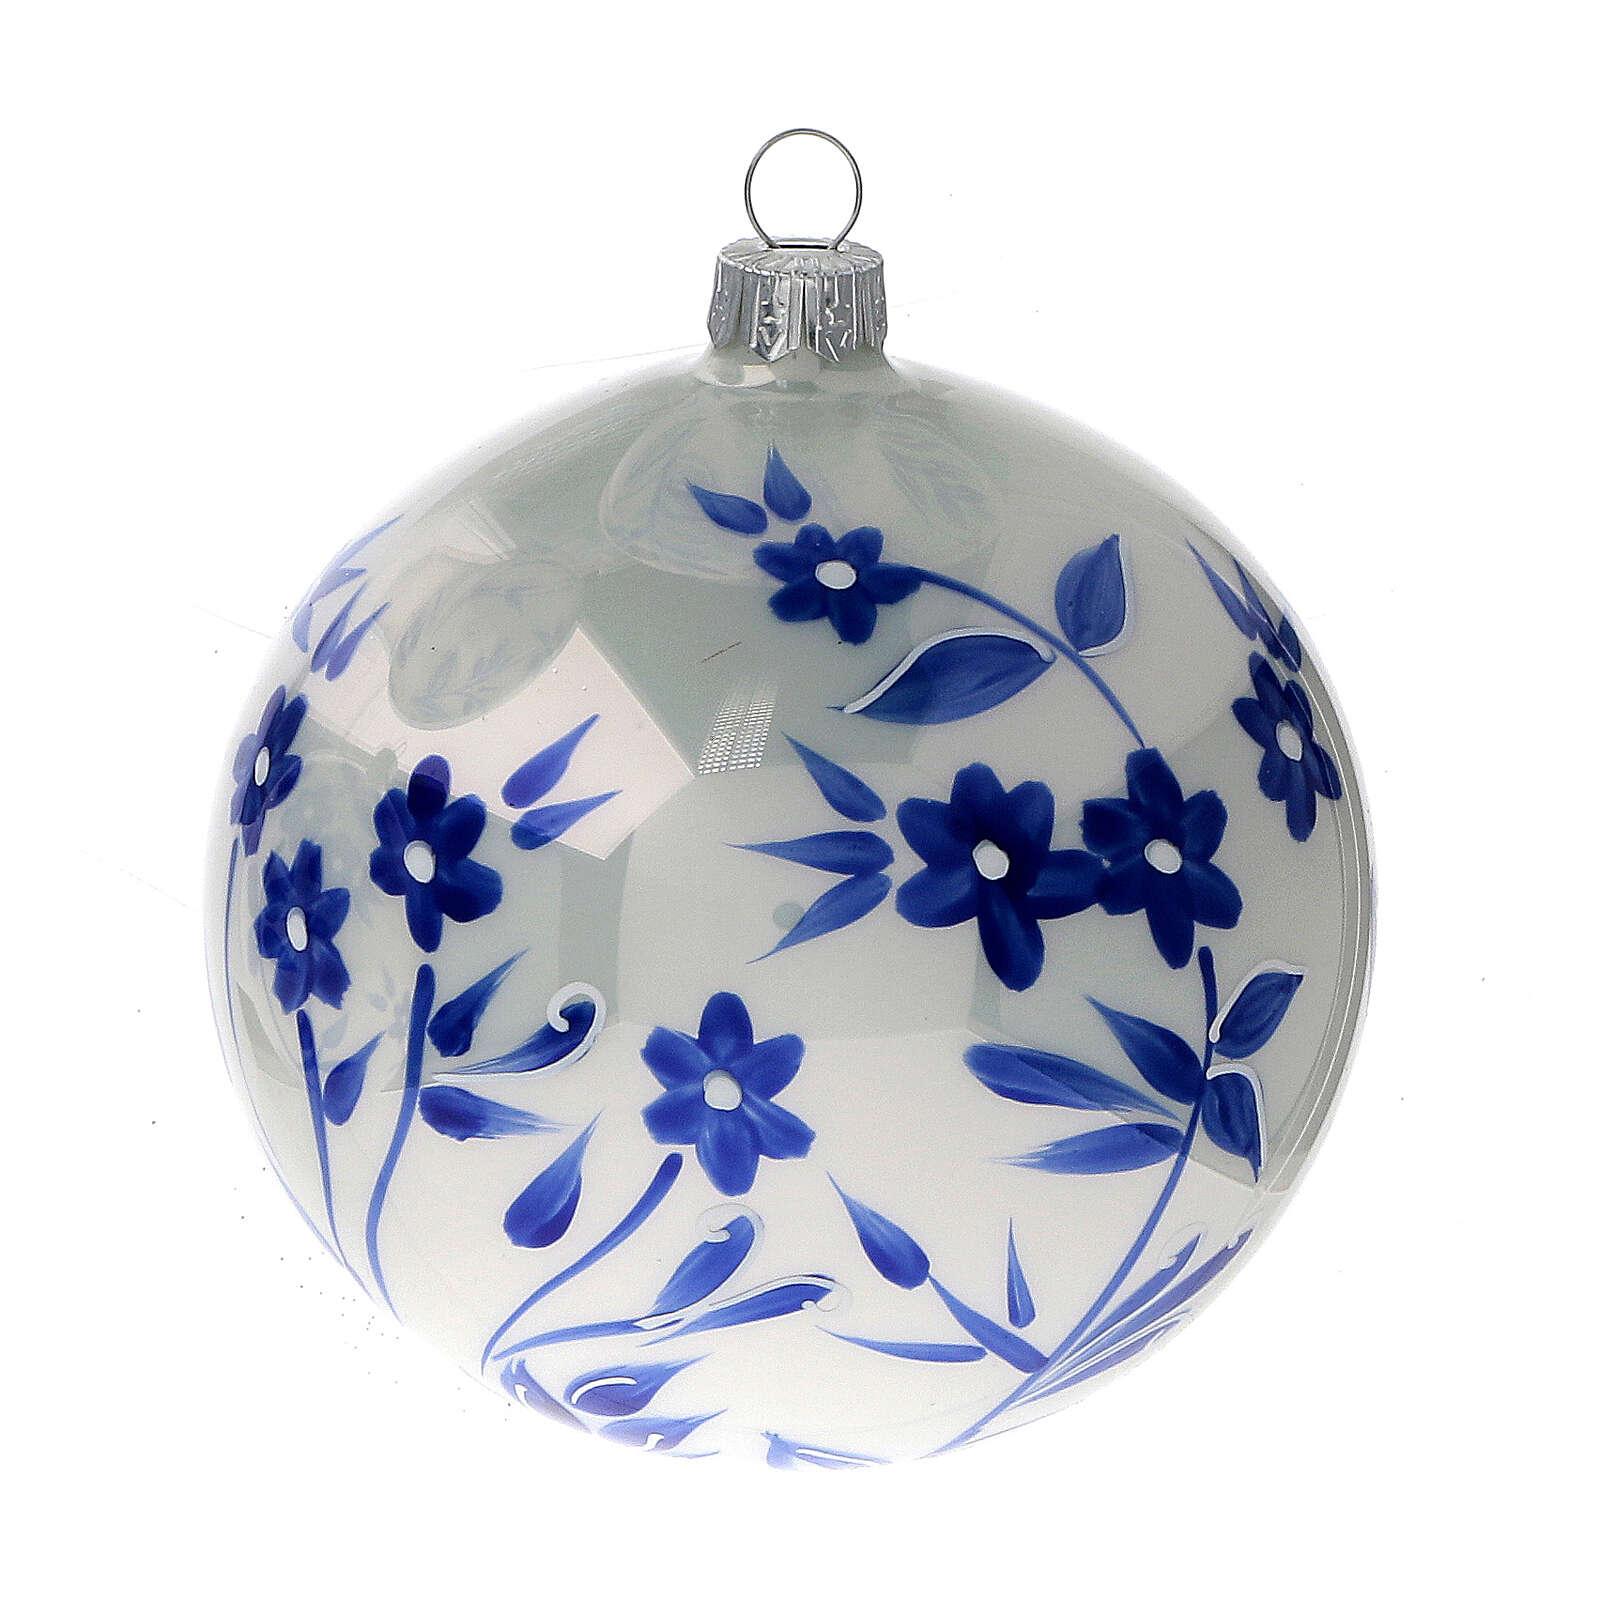 Christmas ball ornaments blue white flowers glass blown 100 mm 4 pcs 4